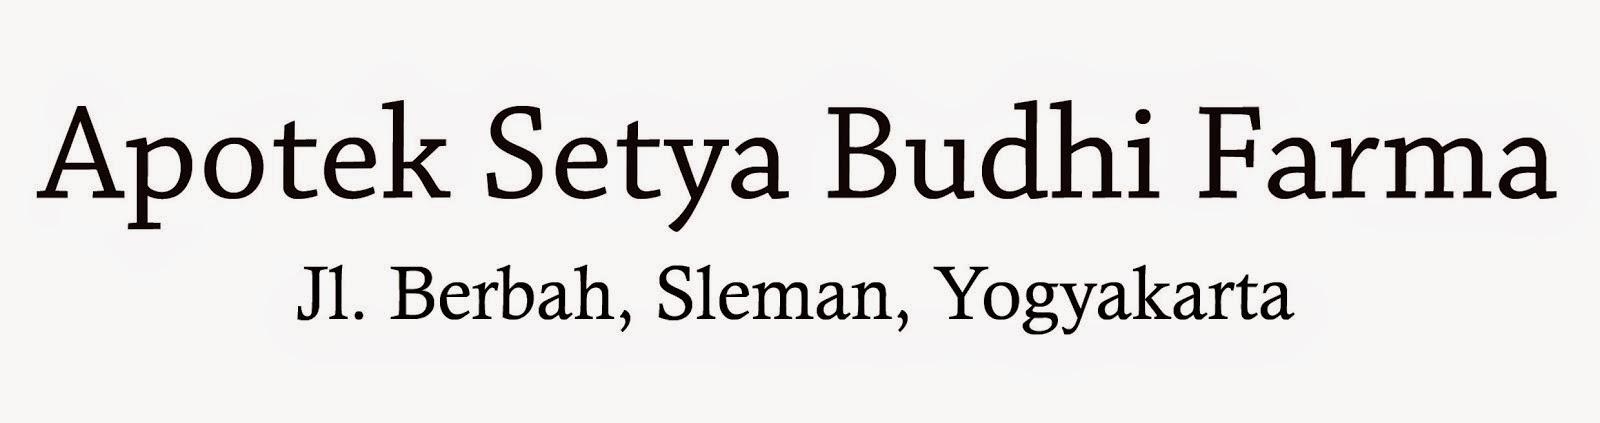 Apotek Setya Budhi Farma